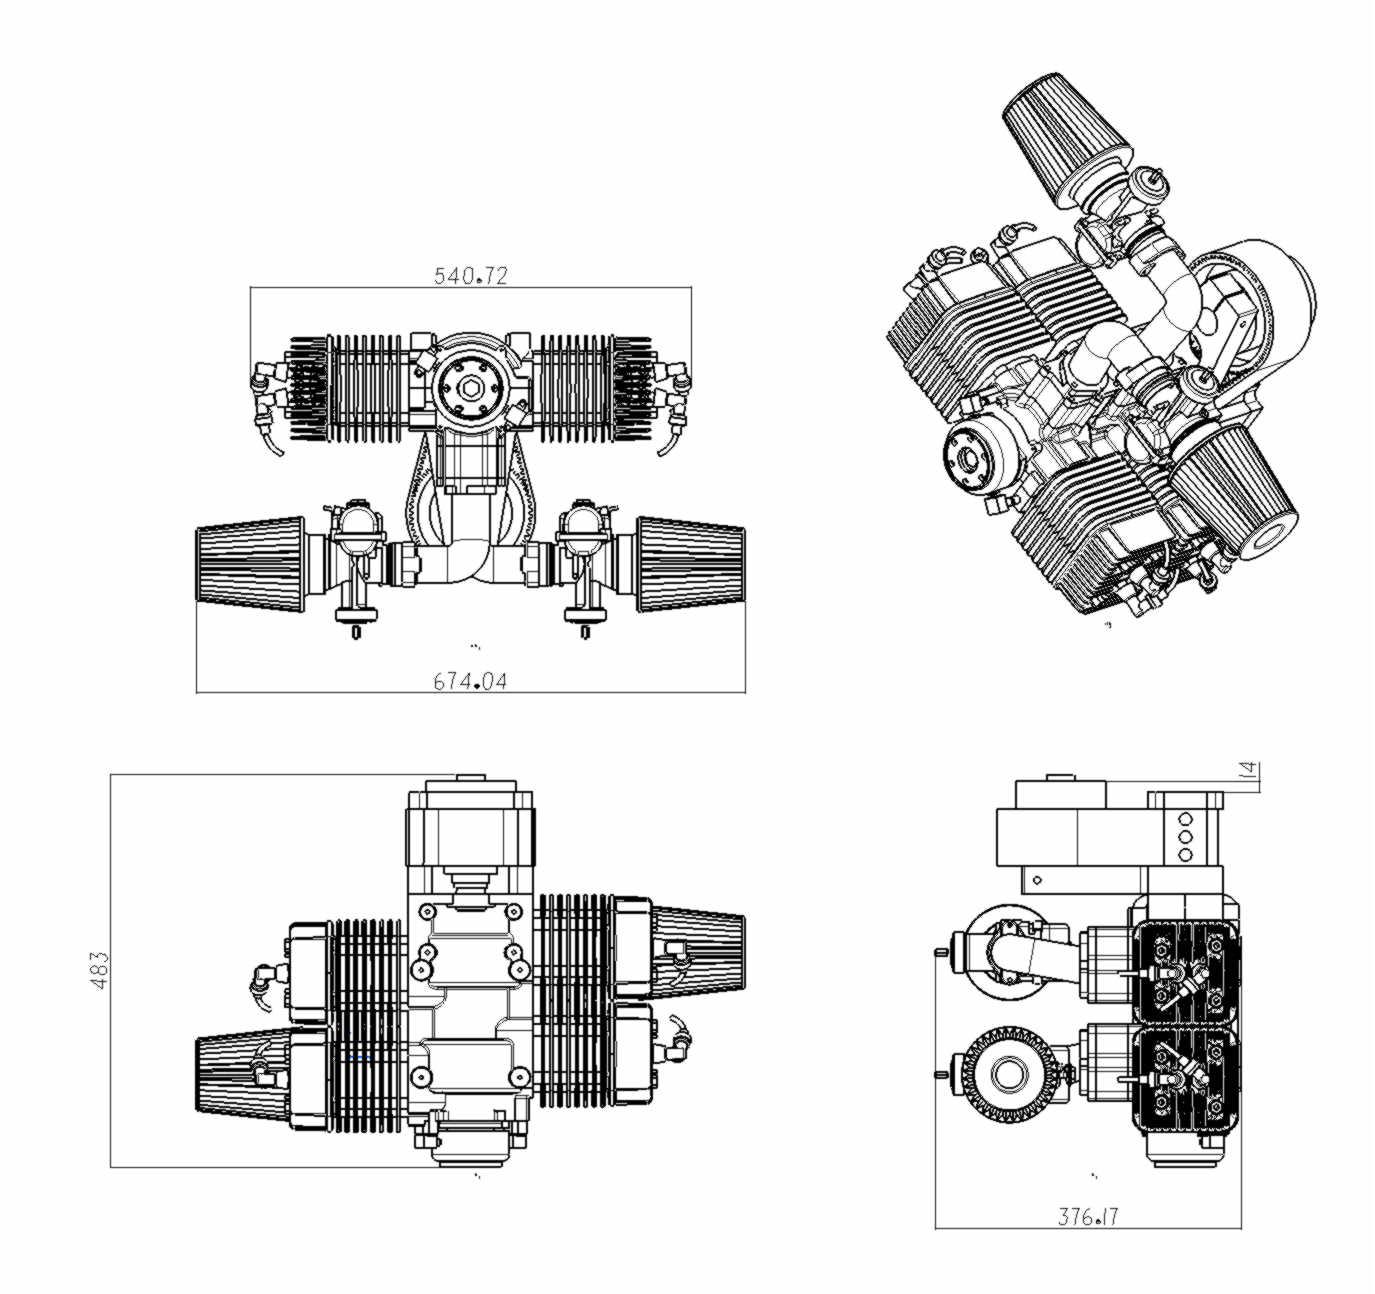 Ultralight Aircraft Engine